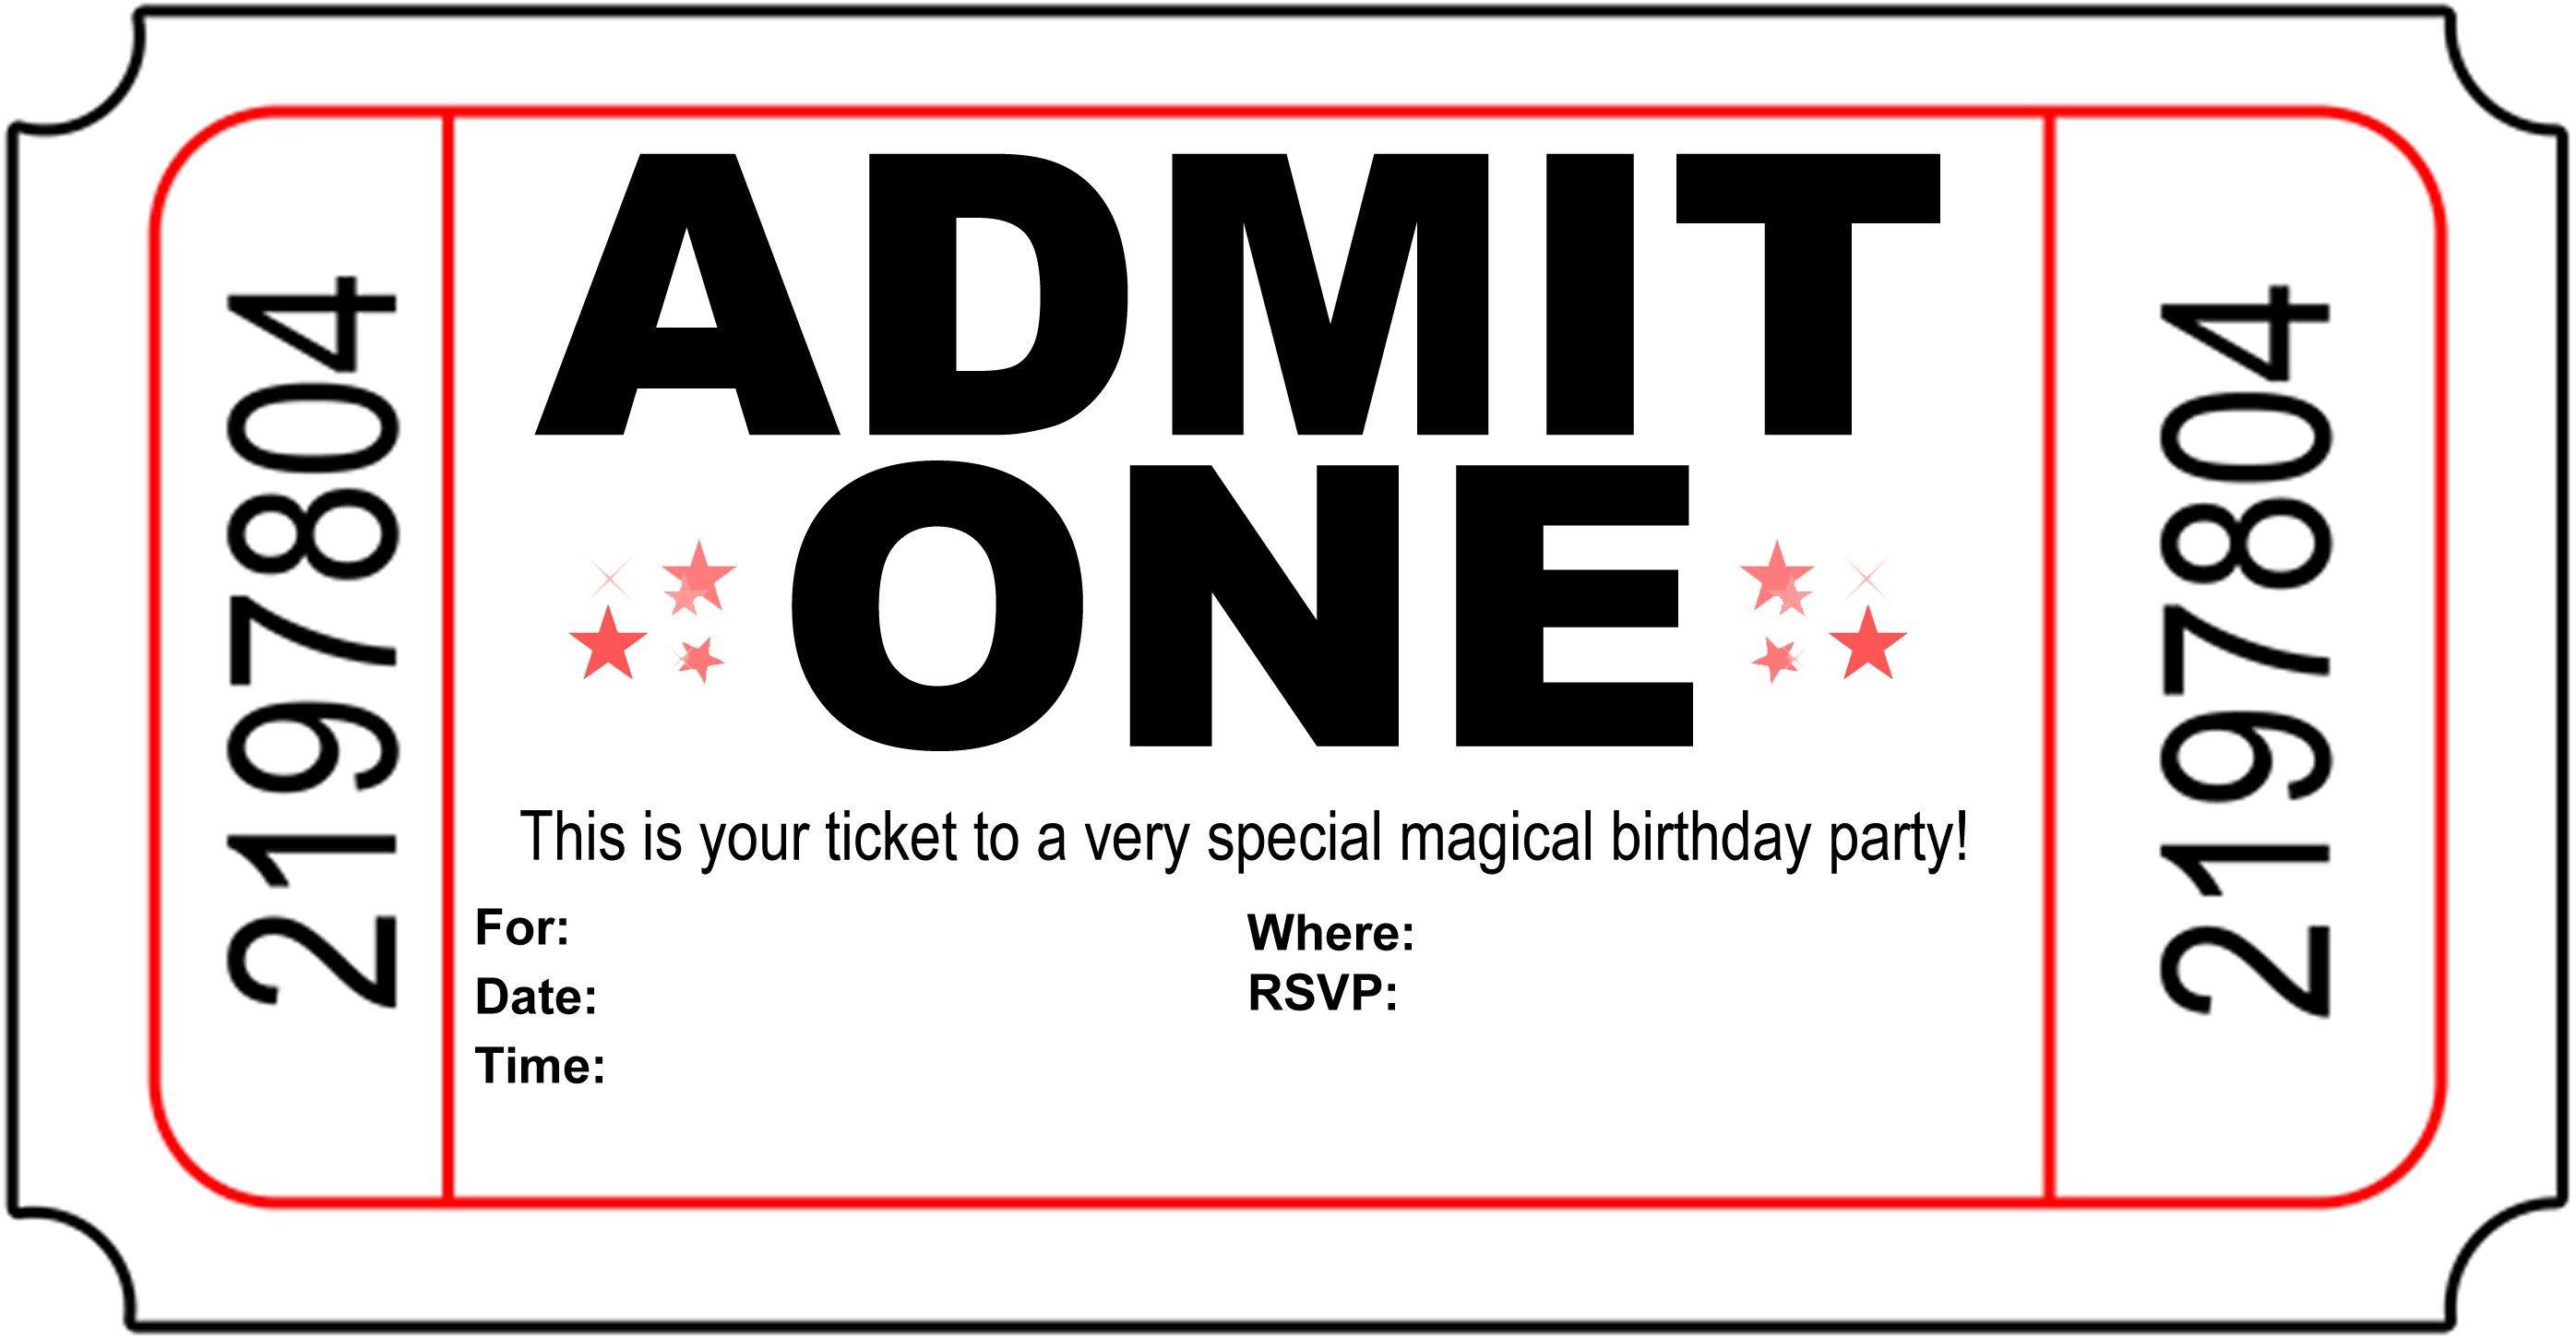 Birthday Party Invitation Free Printable | Printshop. | Pinterest - Free Printable Movie Themed Invitations